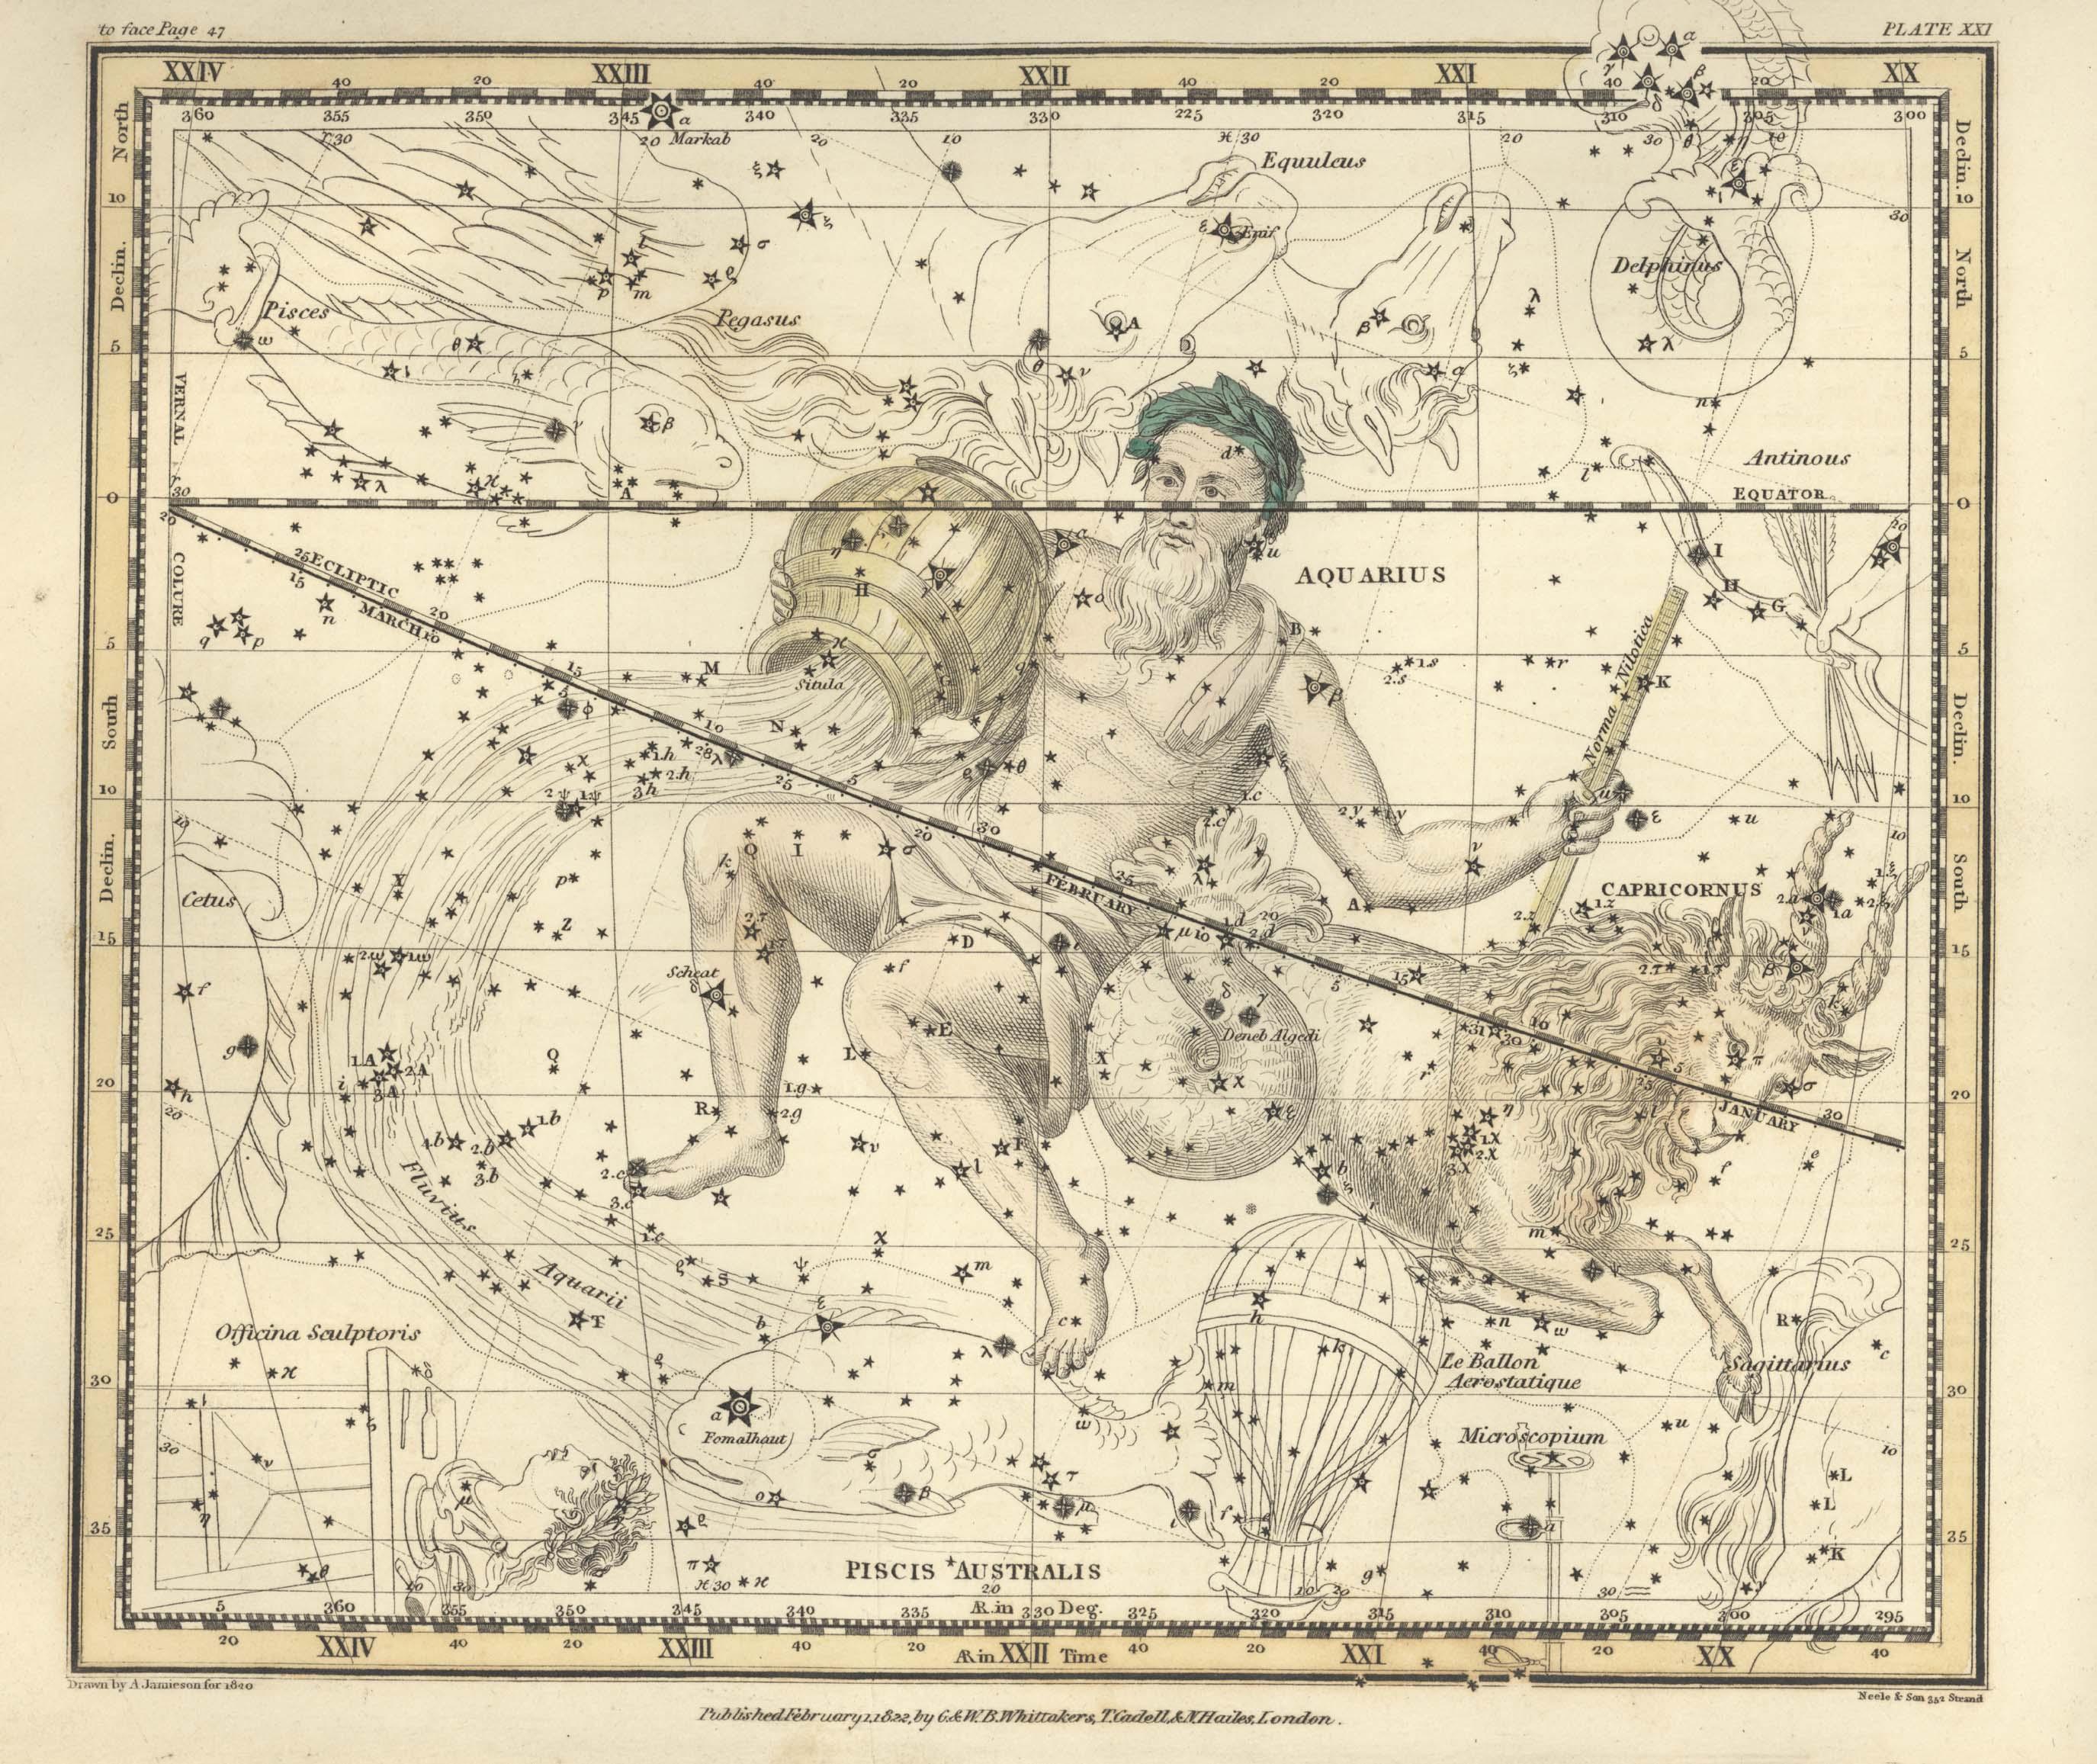 An image of Aquarius from a celestial atlas.